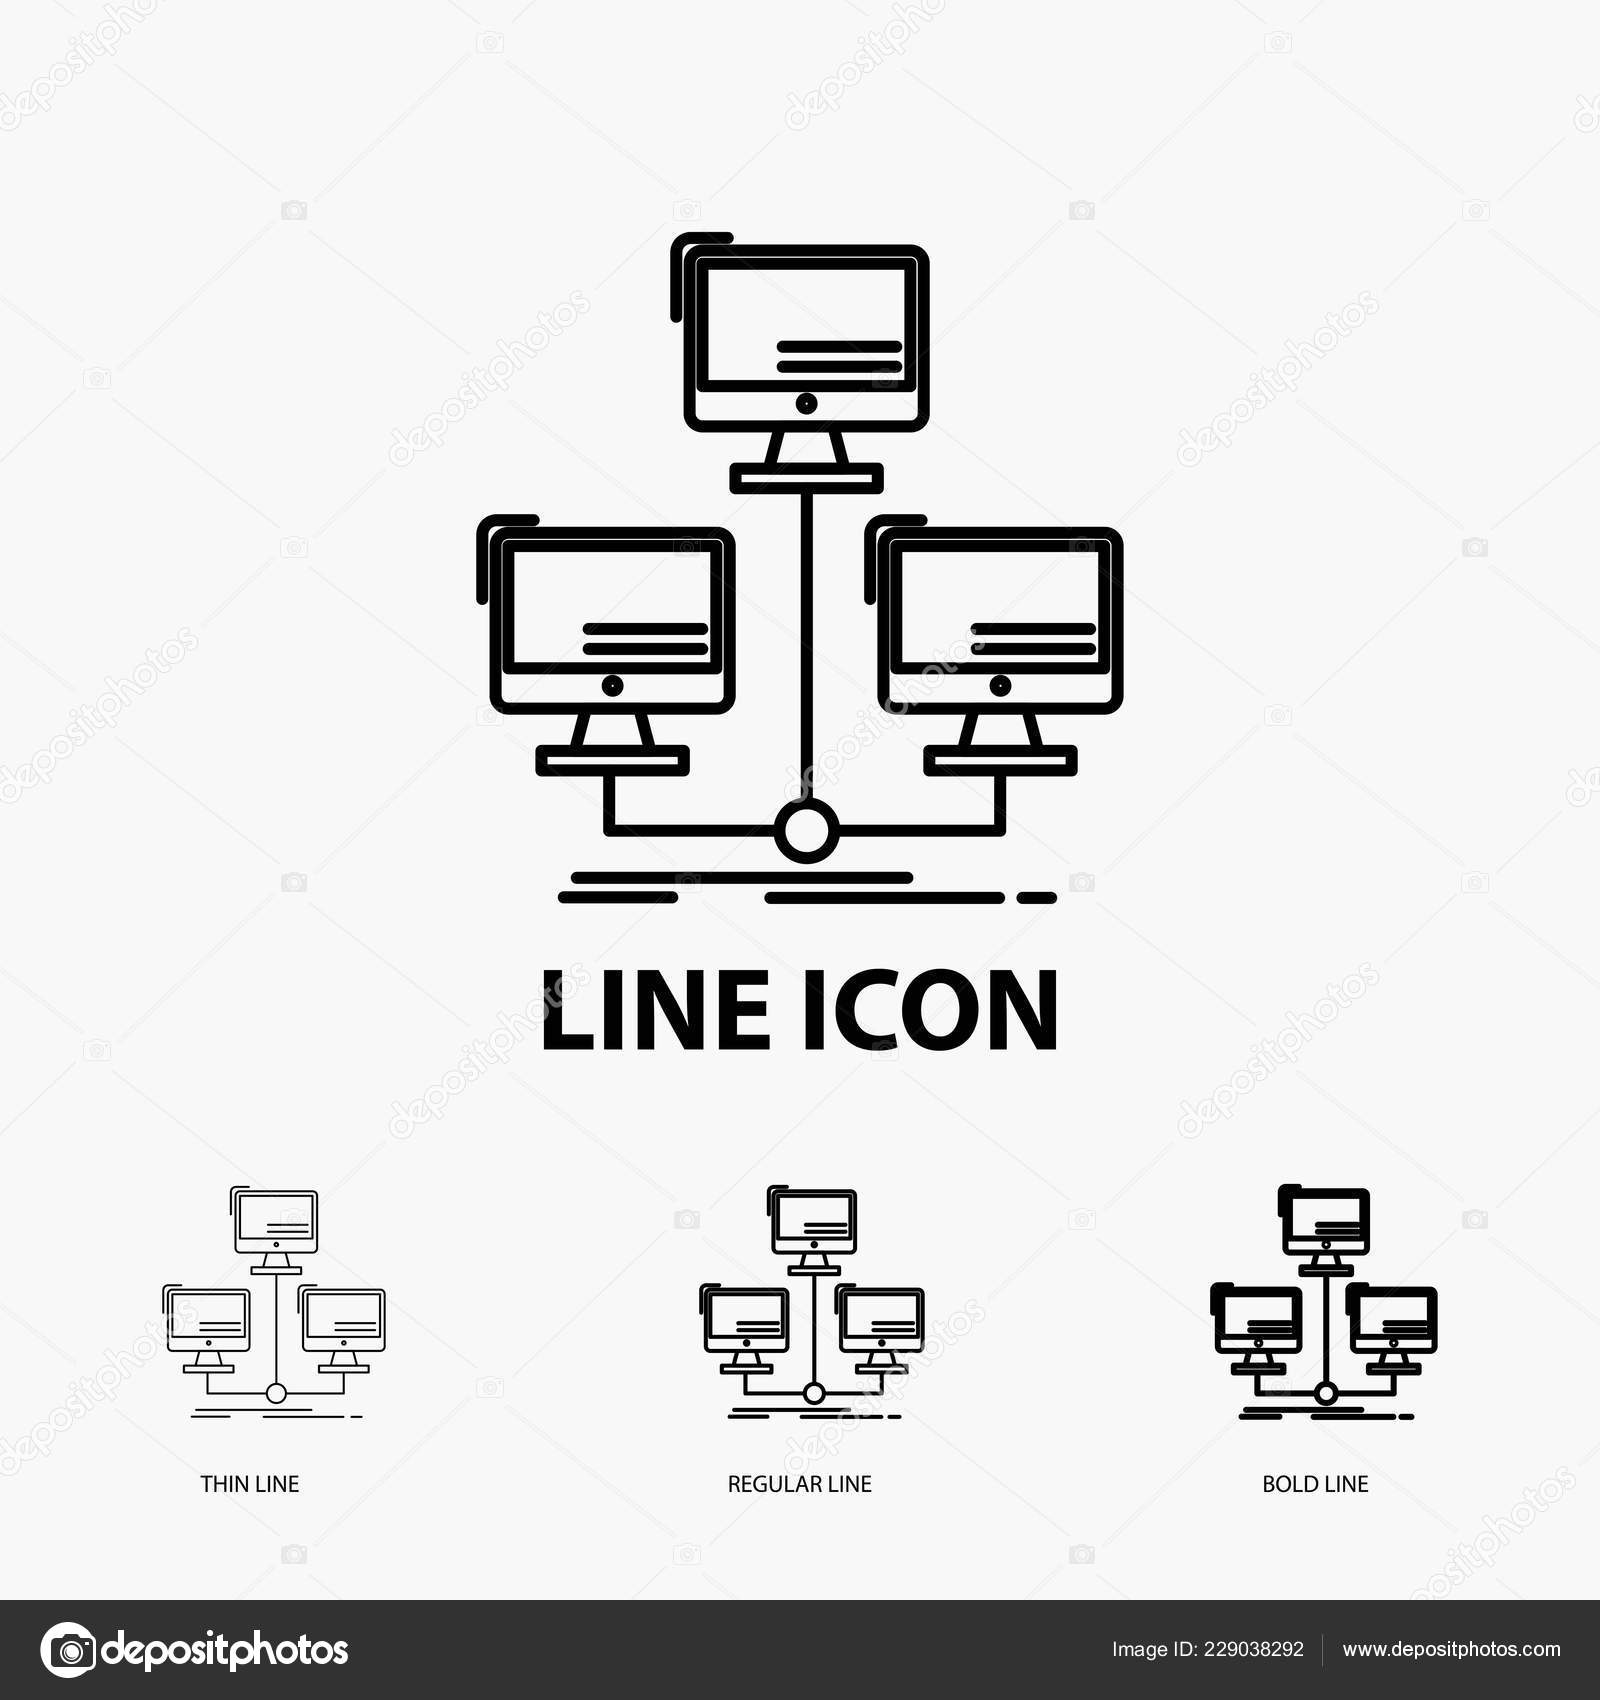 wiring diagram icon wiring diagram database  puter network diagram icon wiring diagram database wiring diagram symbols chart network server diagram icon wiring